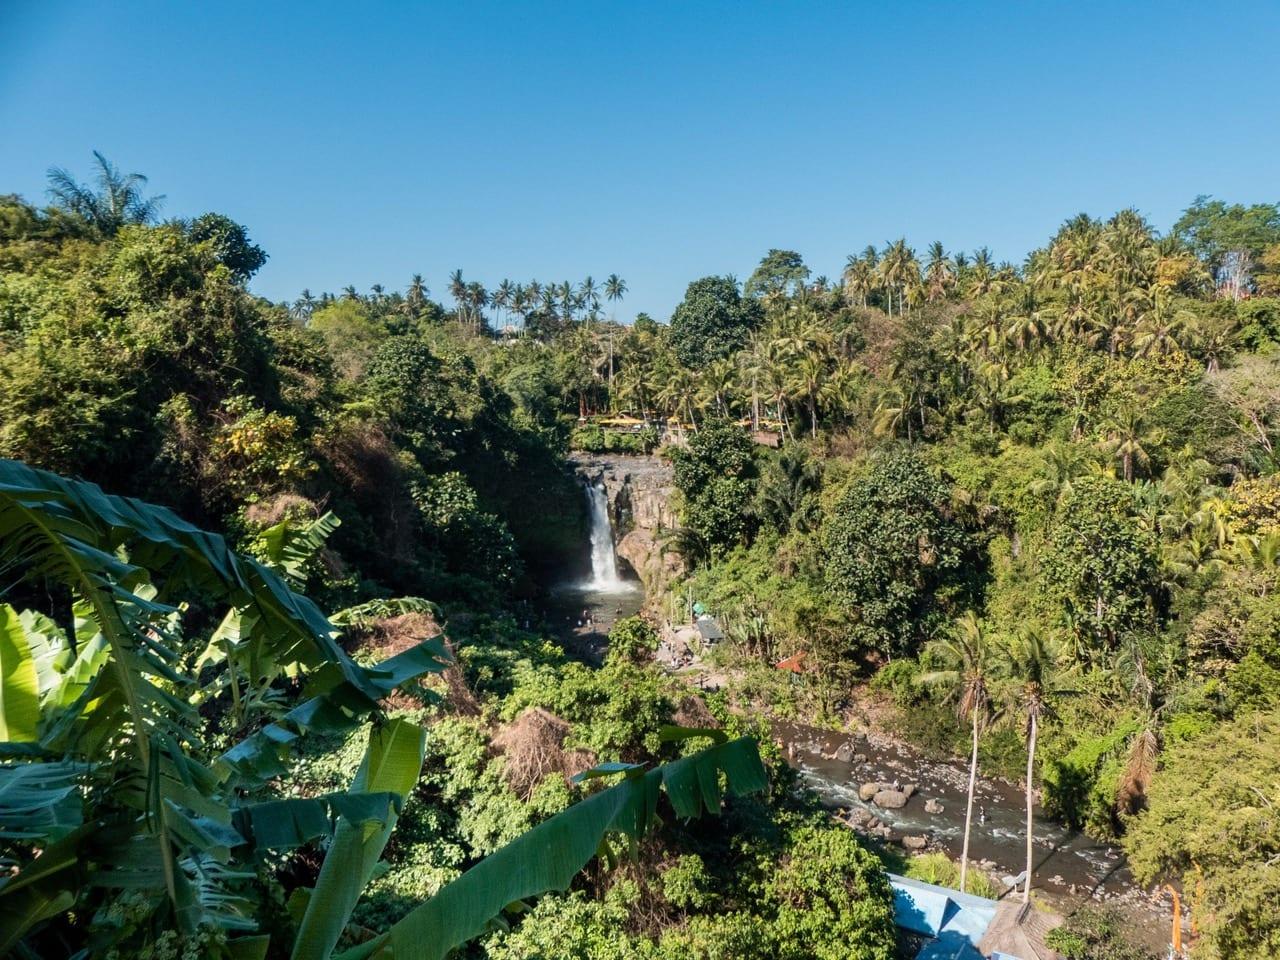 A guide to all the best waterfalls in Ubud Bali - Tegenungan Waterfall